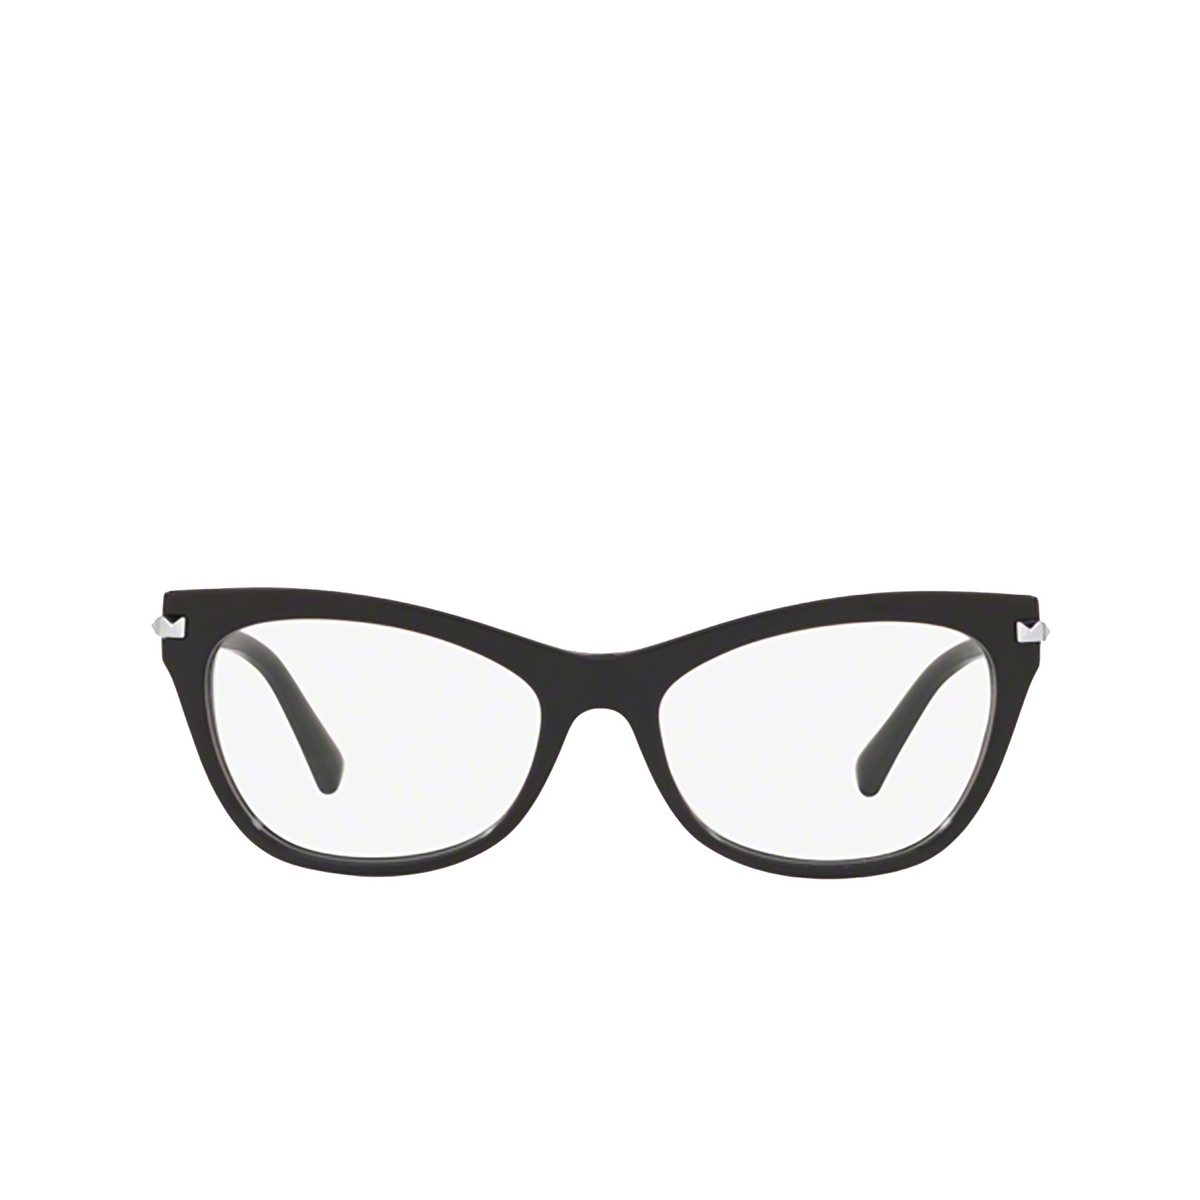 Valentino® Cat-eye Eyeglasses: VA3041 color Black 5001 - front view.